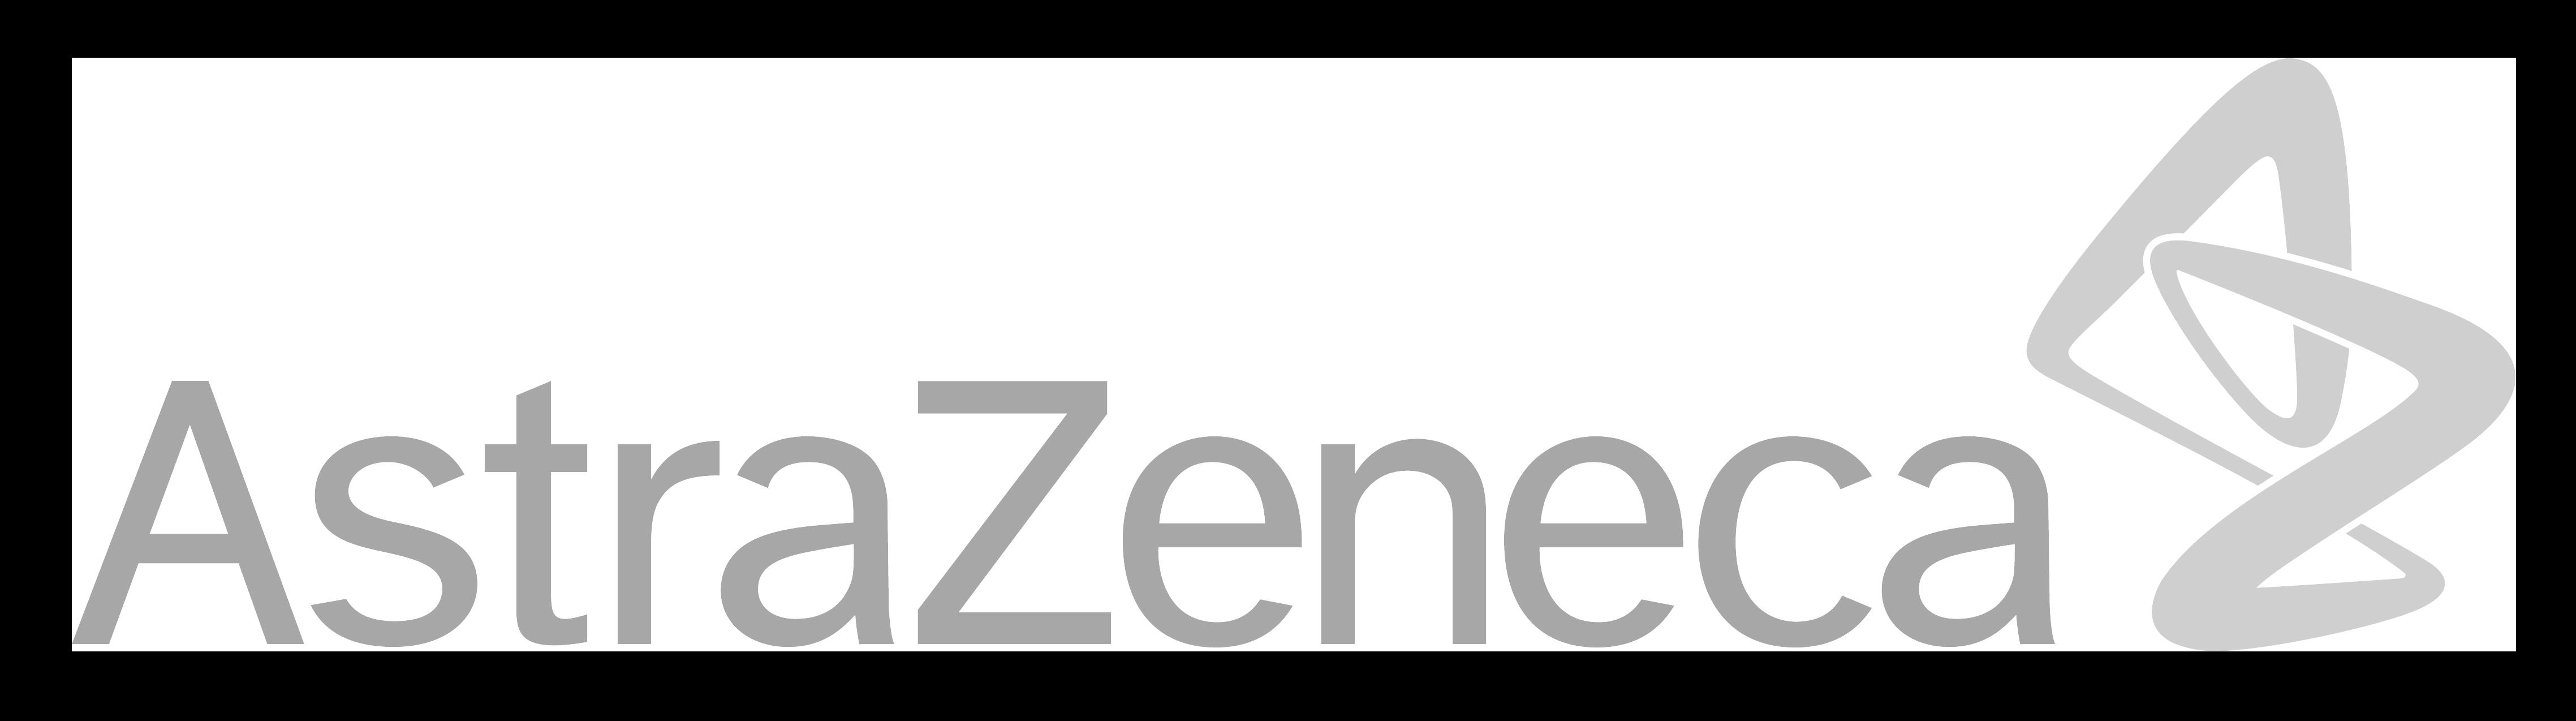 Astrazeneca-nQuery-customer